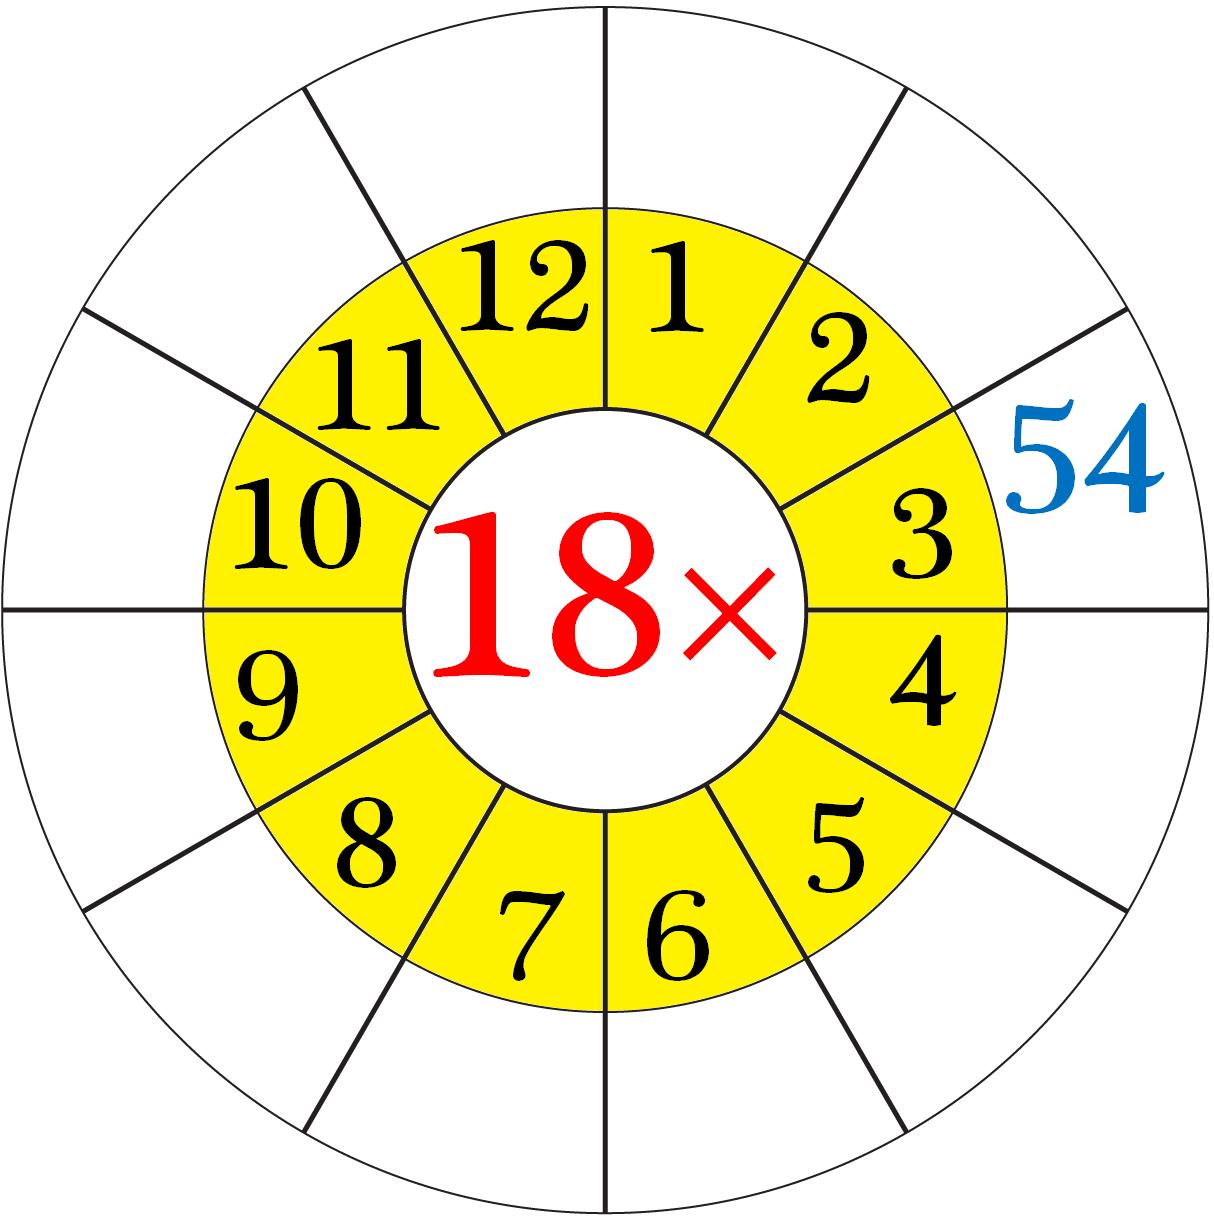 Worksheet on Multiplication Table of 18